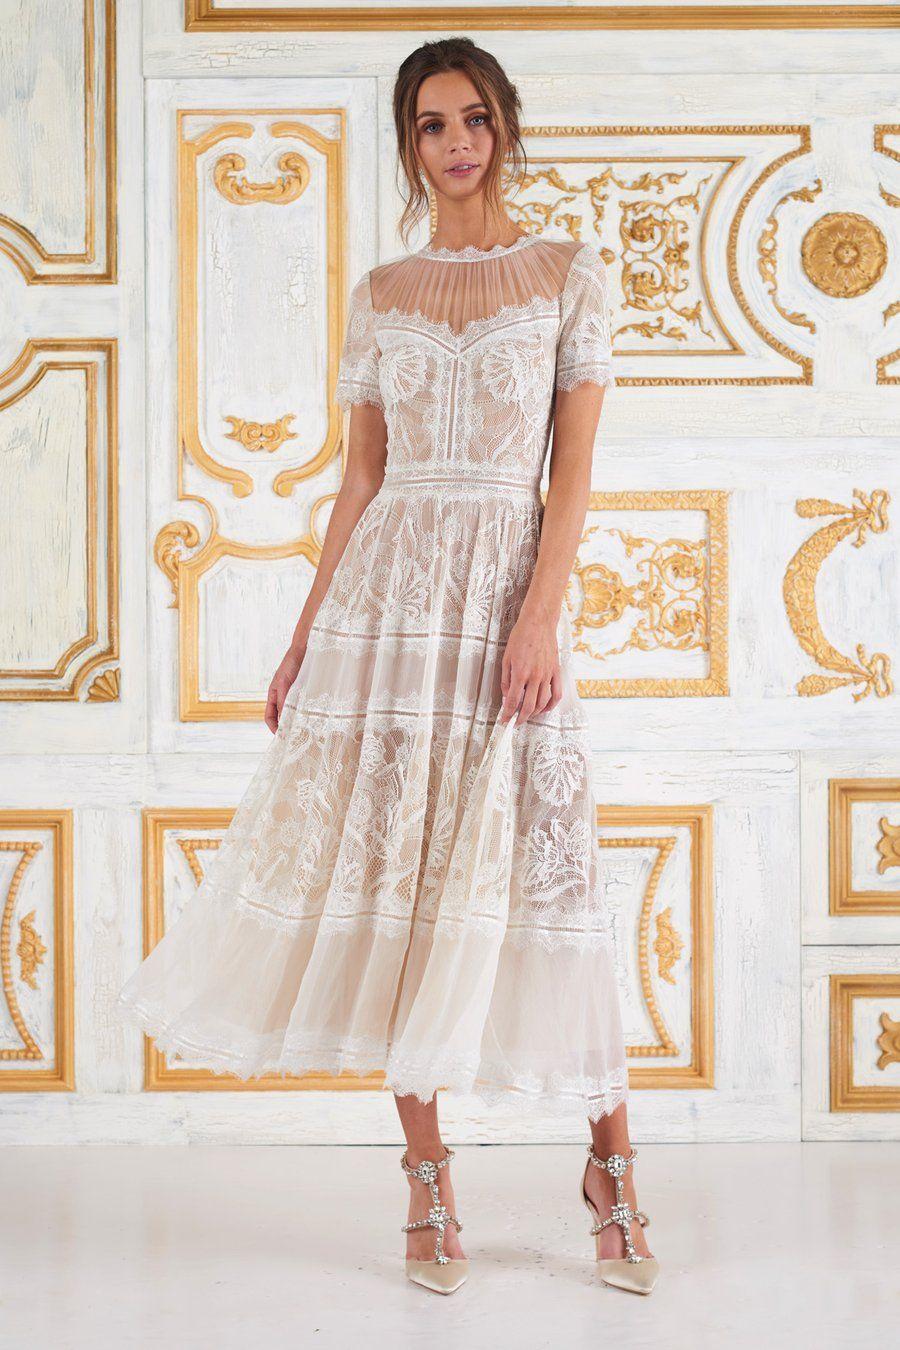 Tadashi Shoji Lace Jewel A Line Cocktail Dress Cocktail Dress Wedding Tea Length Dresses Midi Wedding Dress [ 1350 x 900 Pixel ]